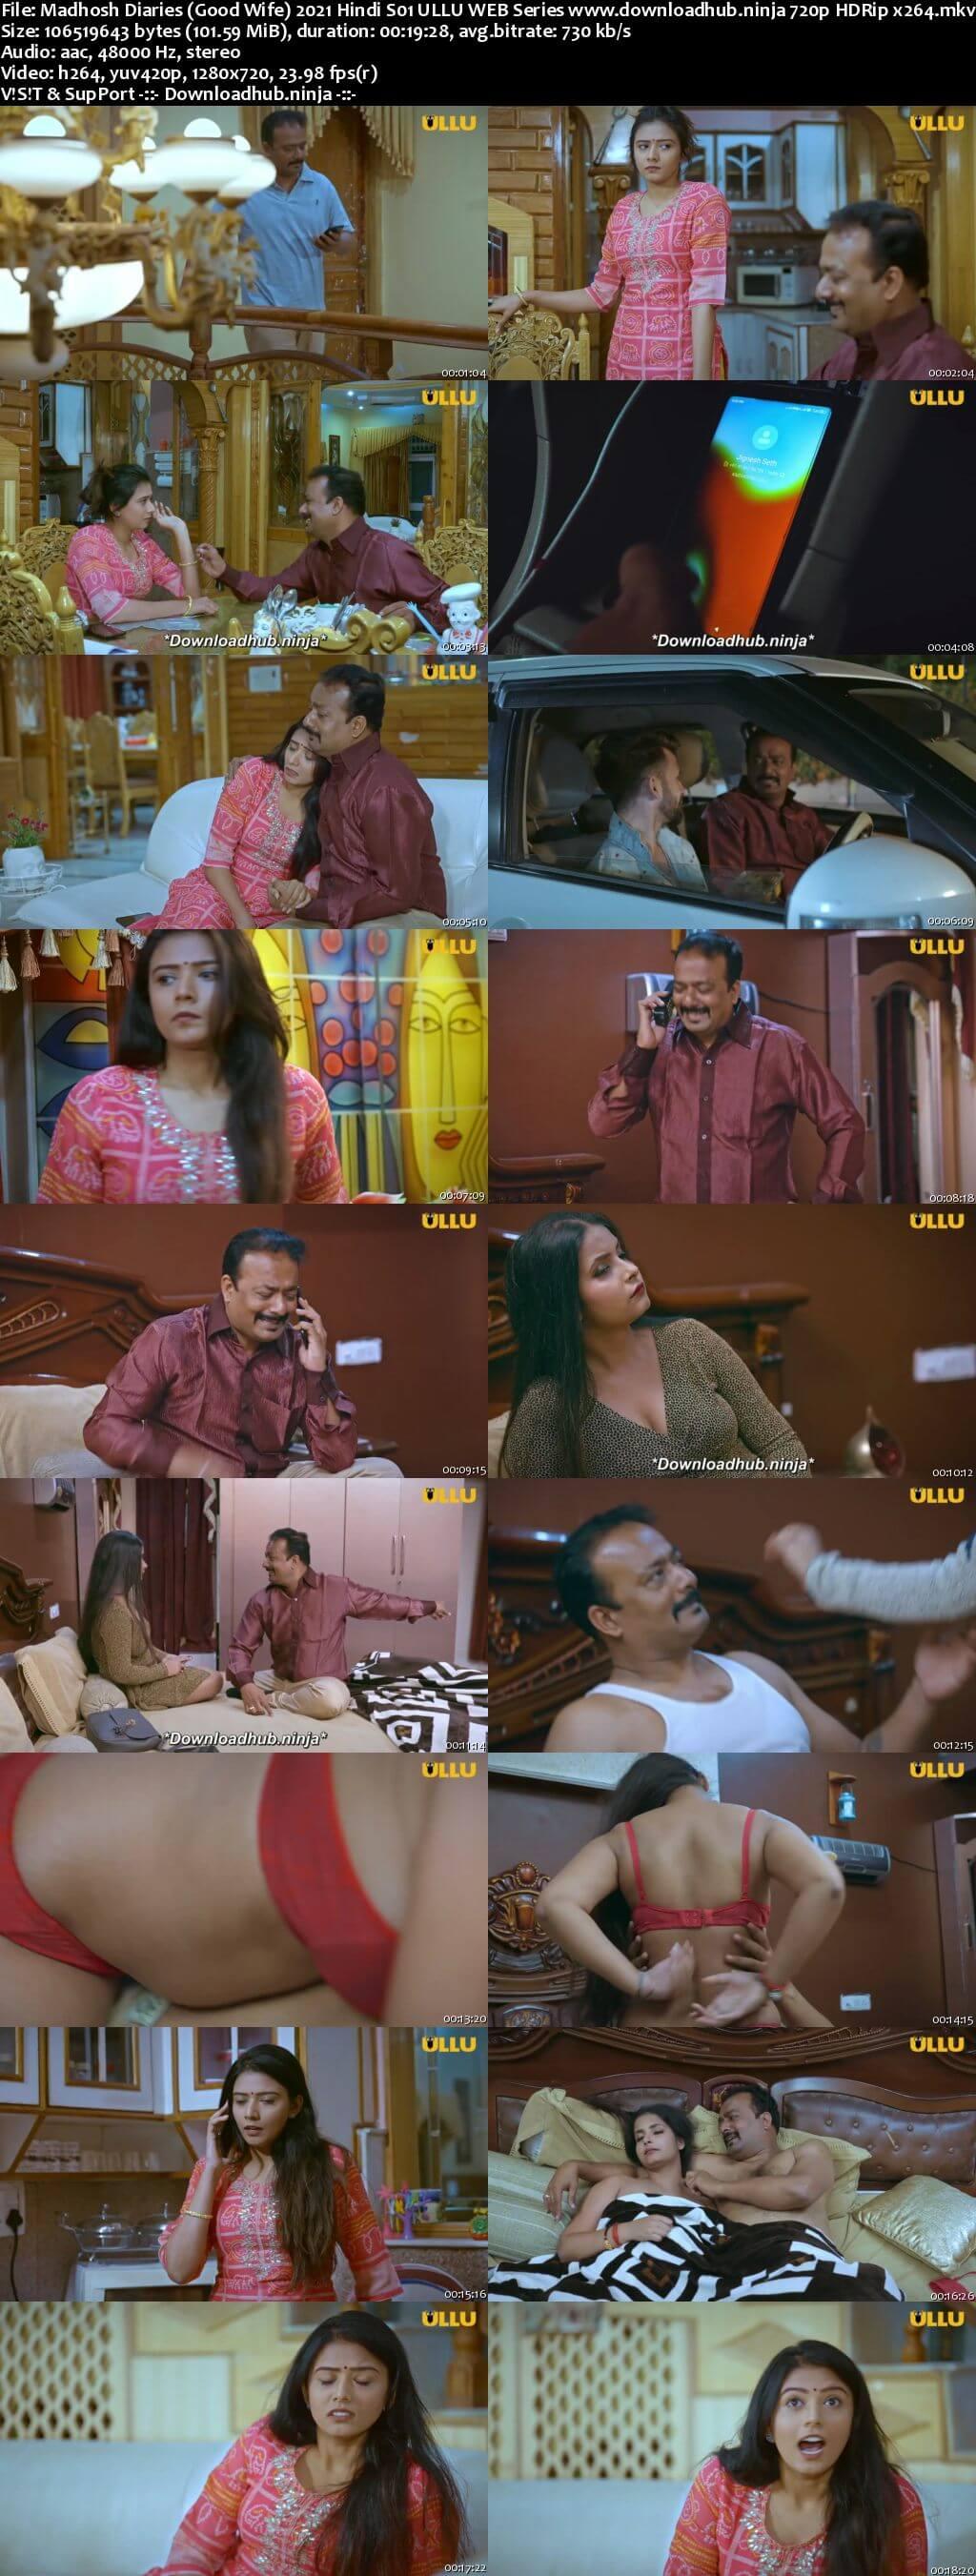 Madhosh Diaries (Good Wife) 2021 Hindi S01 ULLU WEB Series 720p HDRip x264